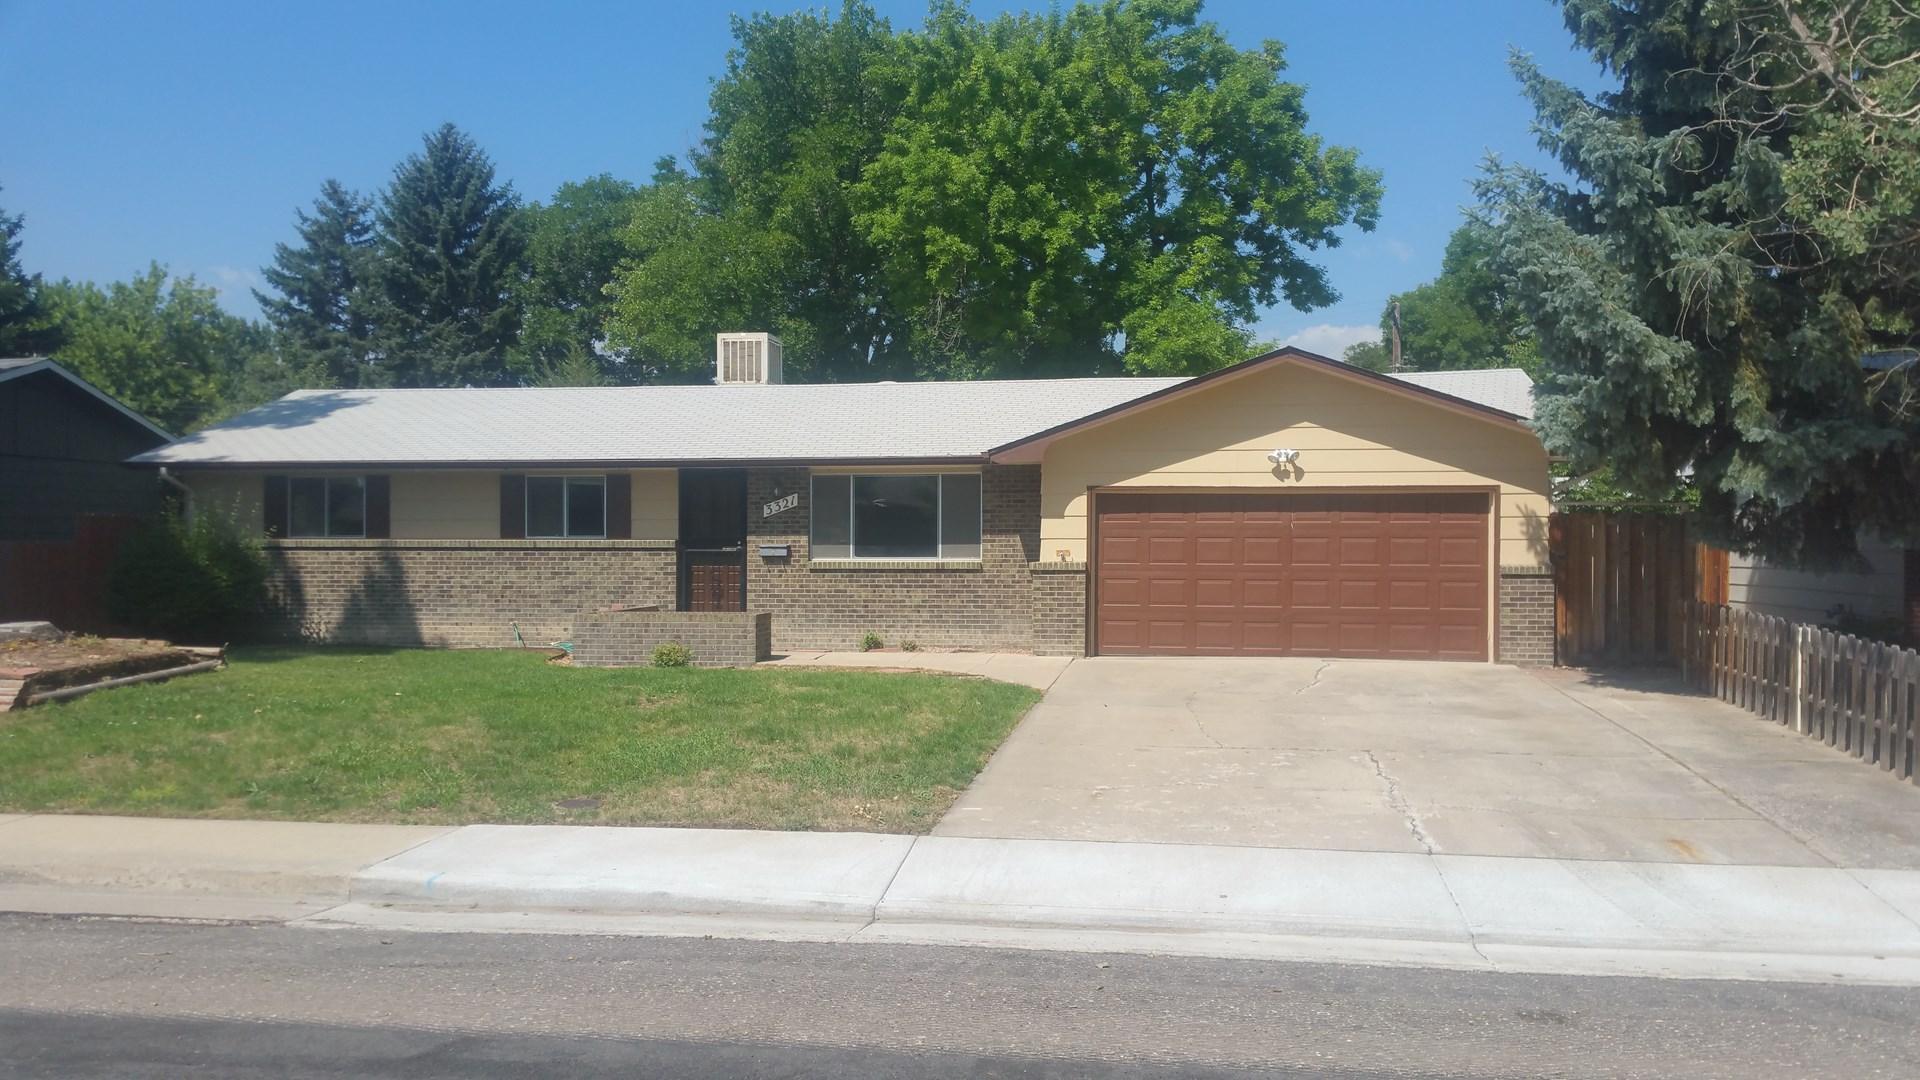 Homes for Sale Loveland, Colorado